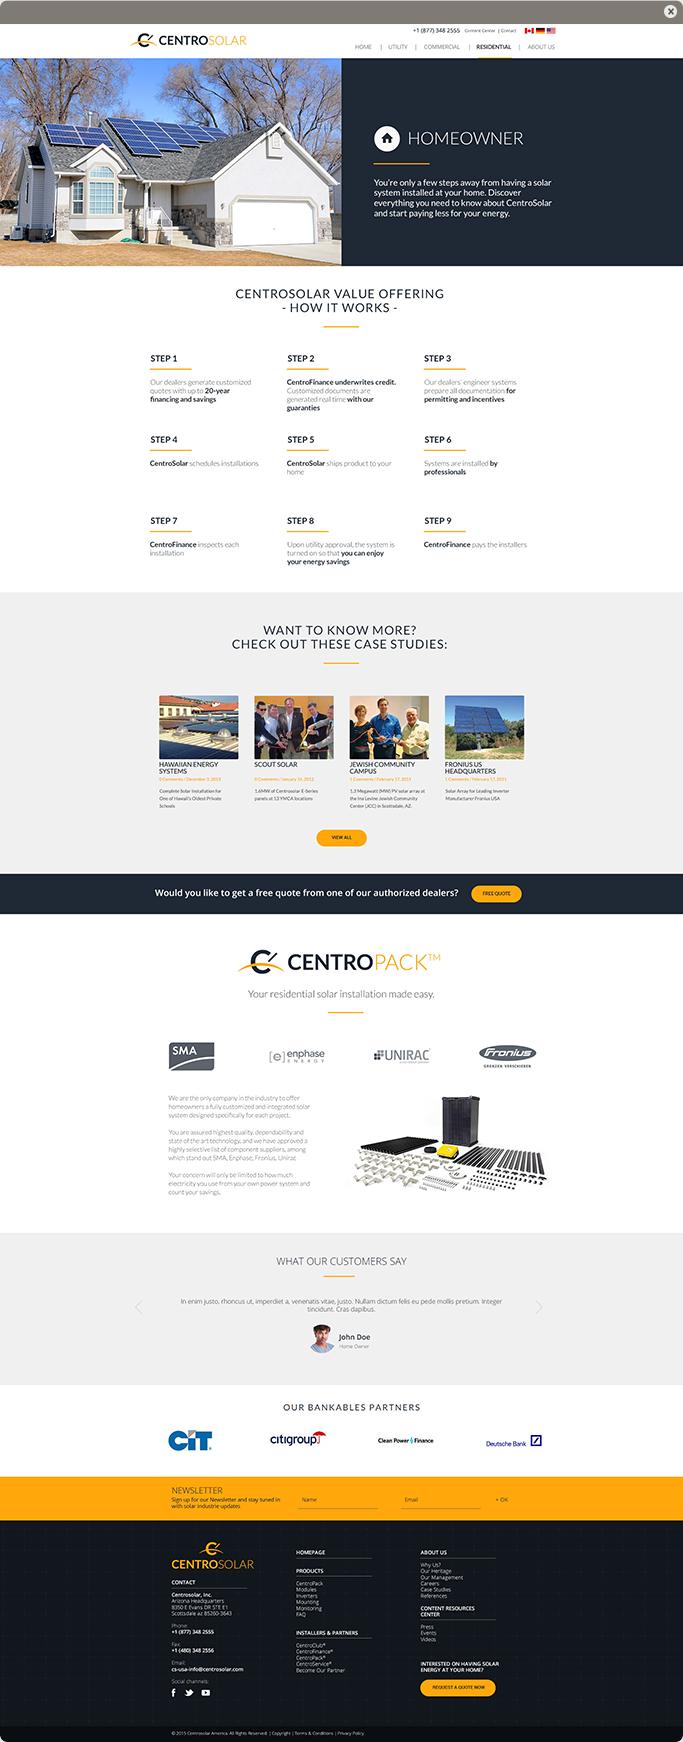 CentroSolar-web02